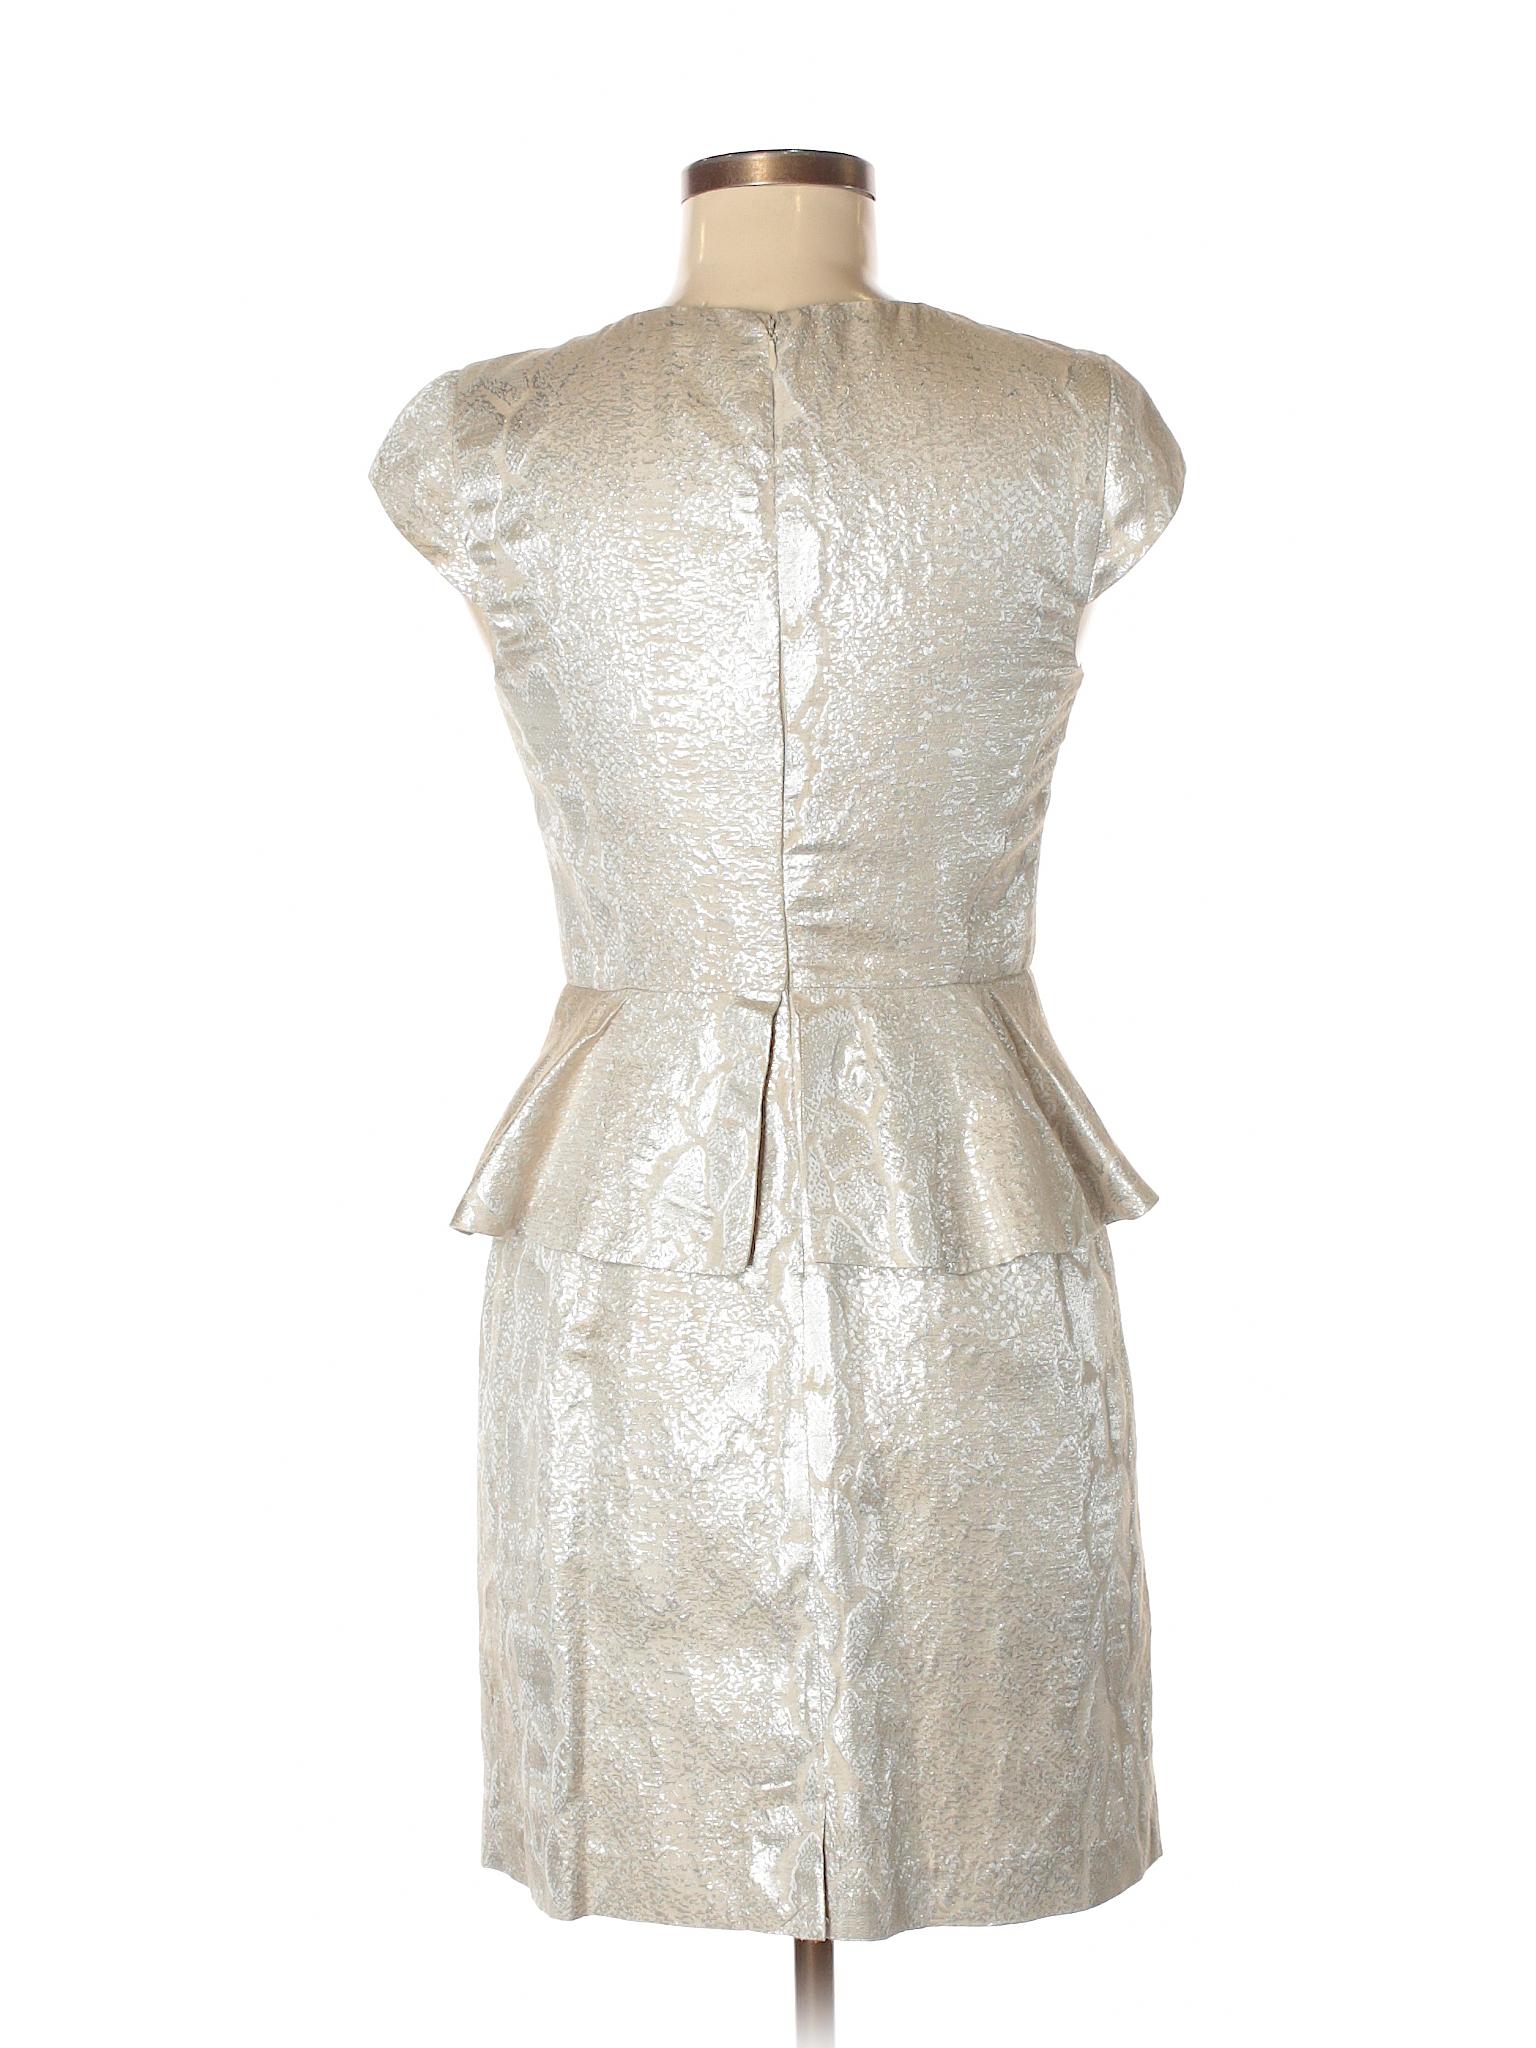 Kensie Cocktail Dress Size 4 00 Tan Women S Dresses 24 99